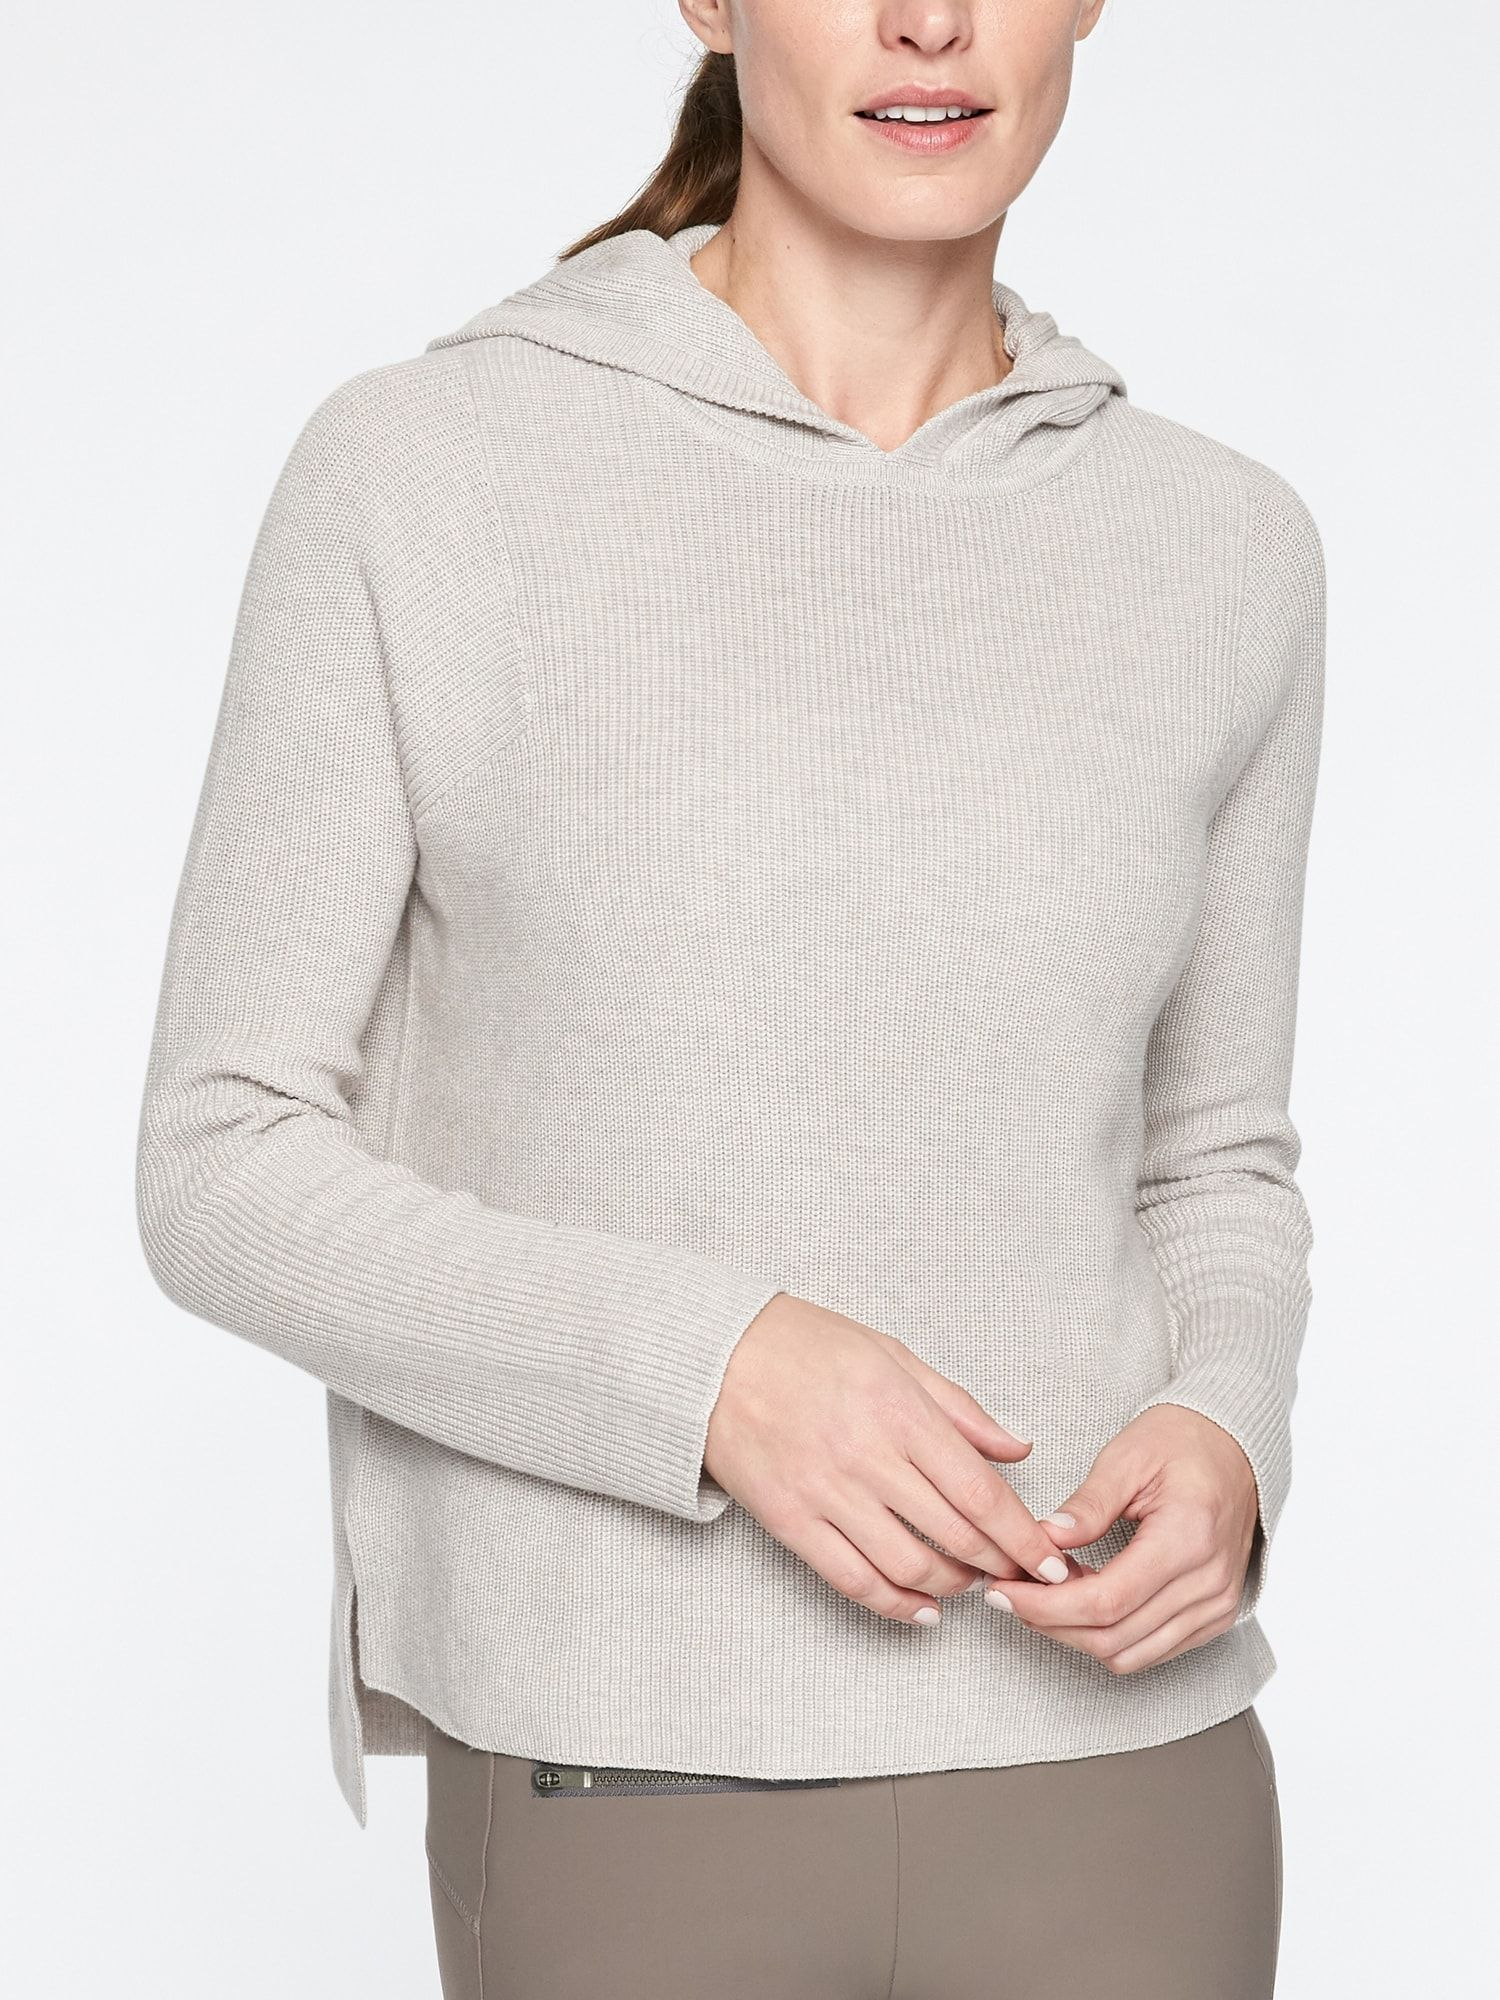 Athleta Sweater Hoodie I Like This Neutral Color Fashion Sweater Hoodie Womens Fashion Spring [ 2000 x 1500 Pixel ]